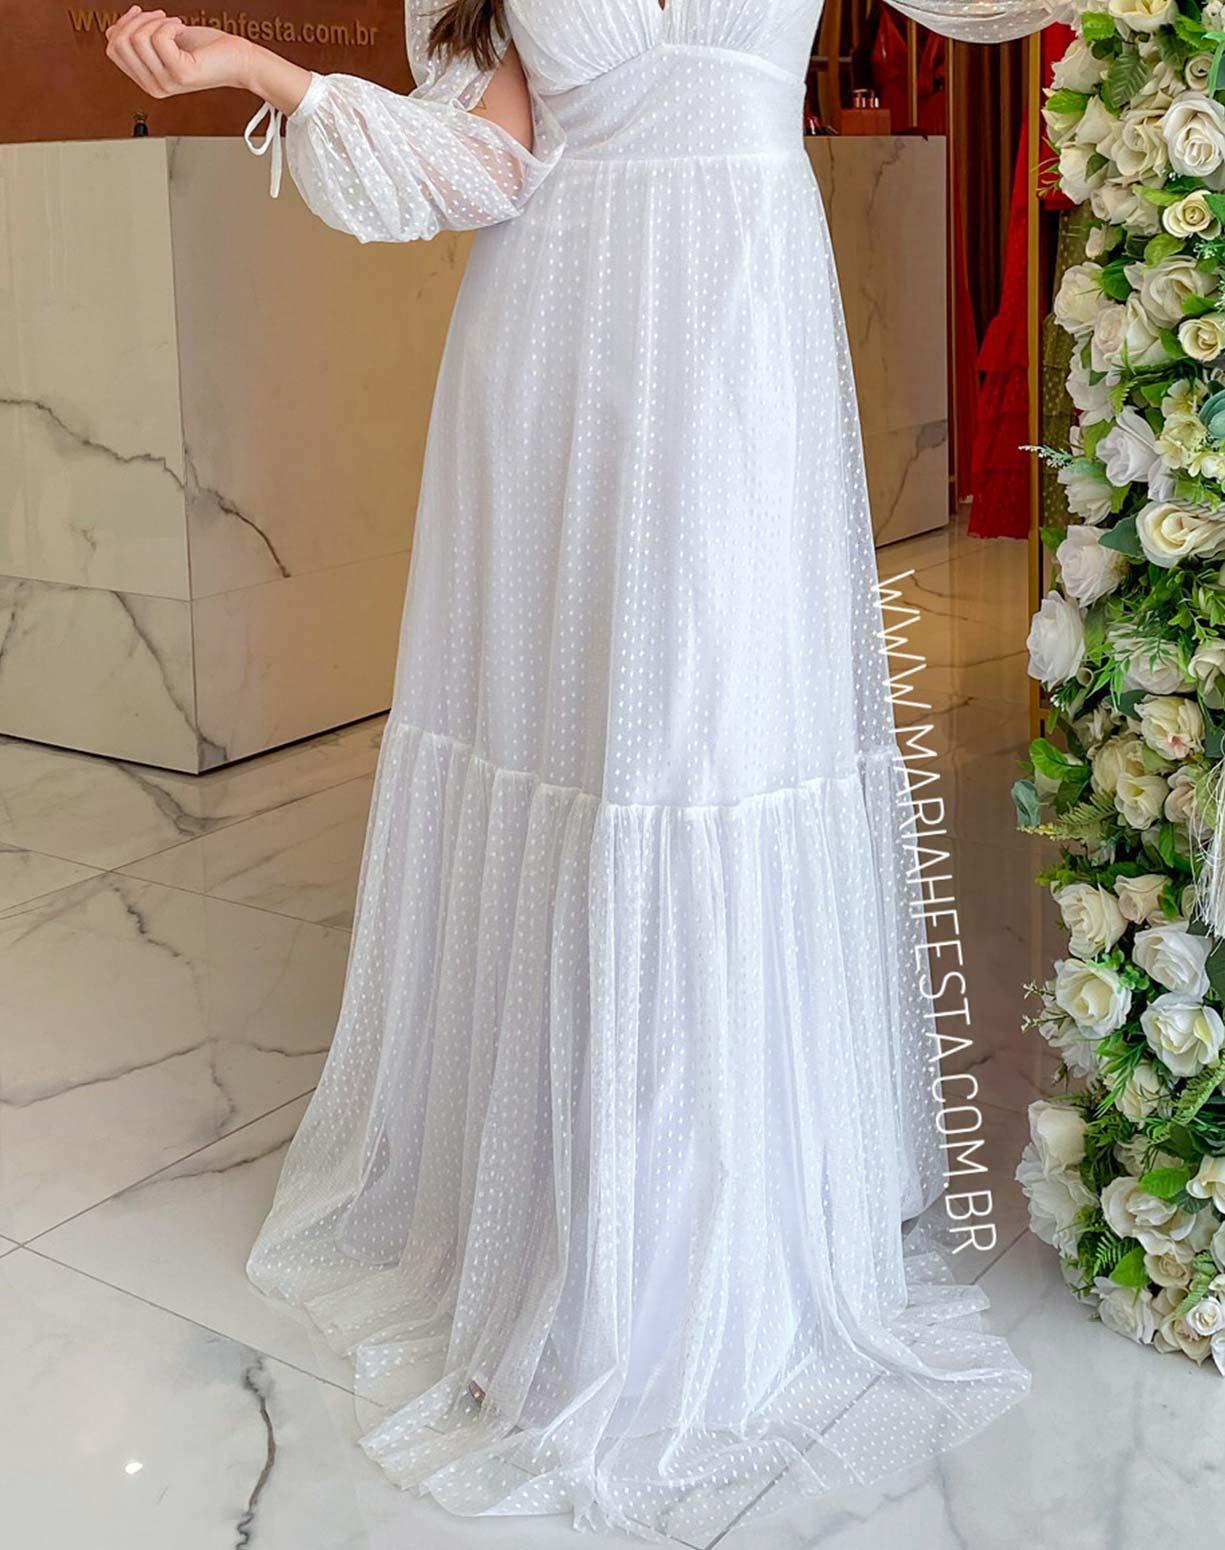 Vestido Branco Manga Longa em Tule Texturizado